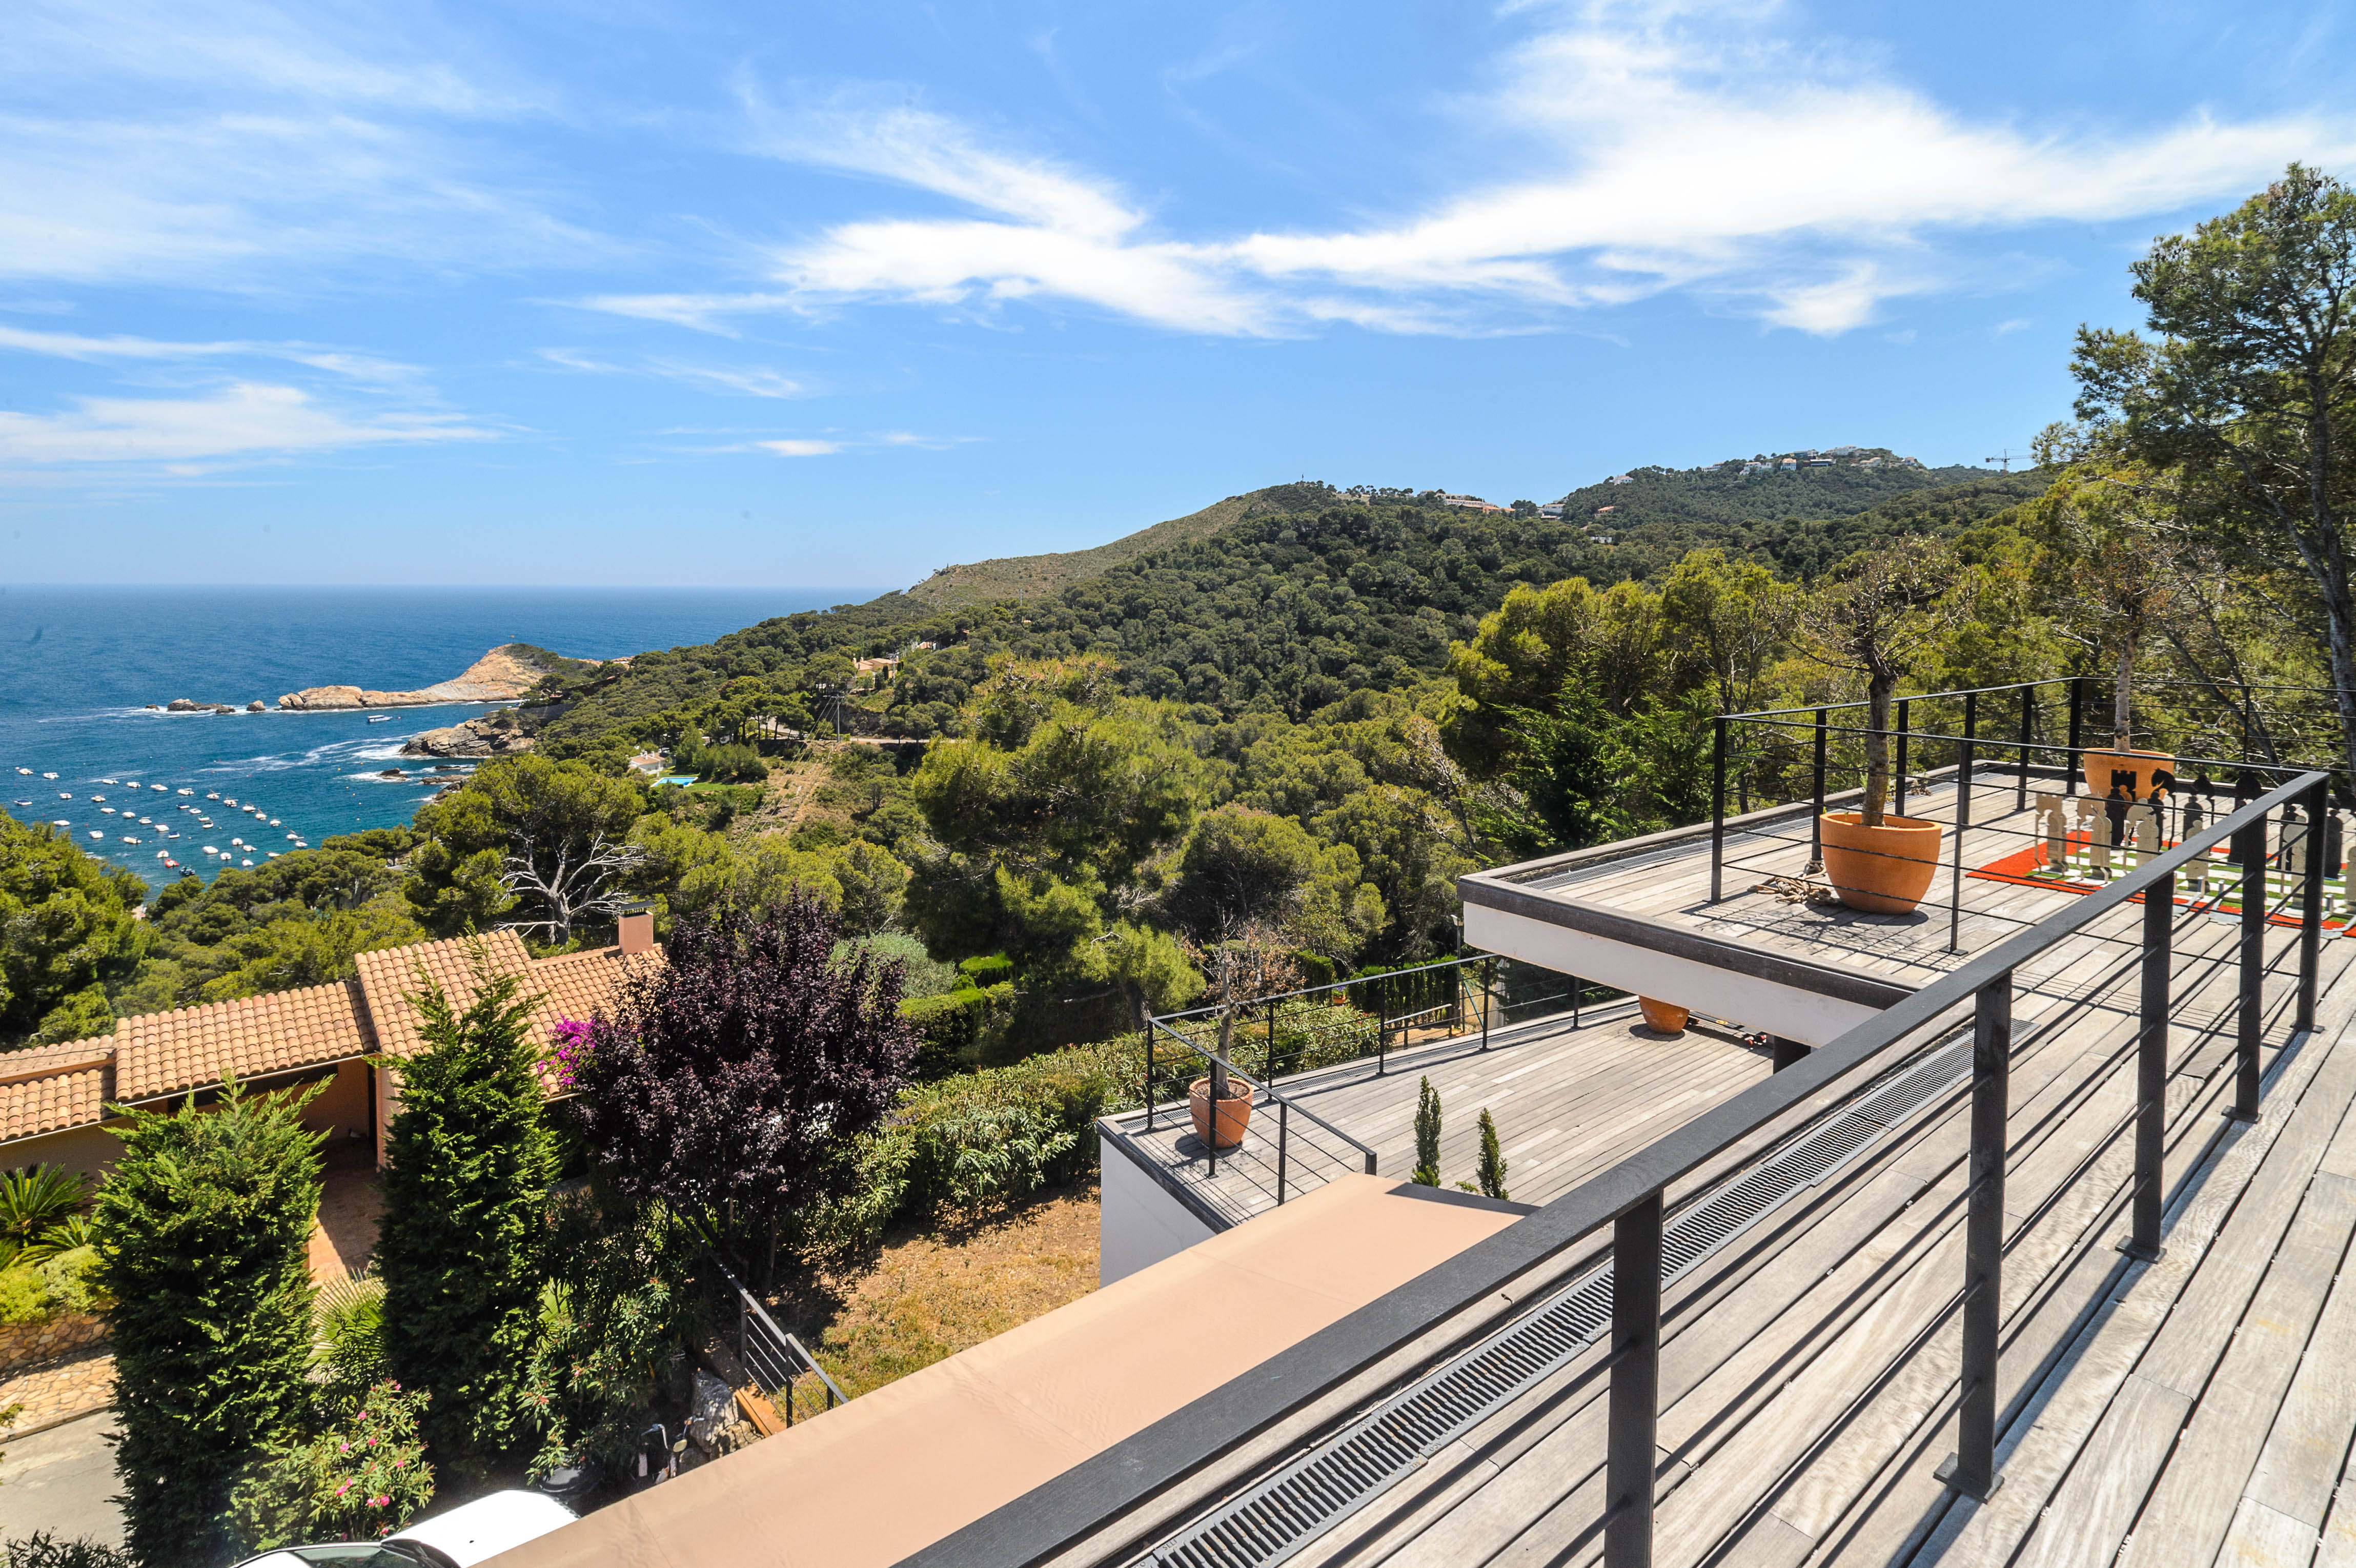 Moradia para Venda às Beautiful house with sea views in the Aiguafreda area Begur, Costa Brava, 17255 Espanha